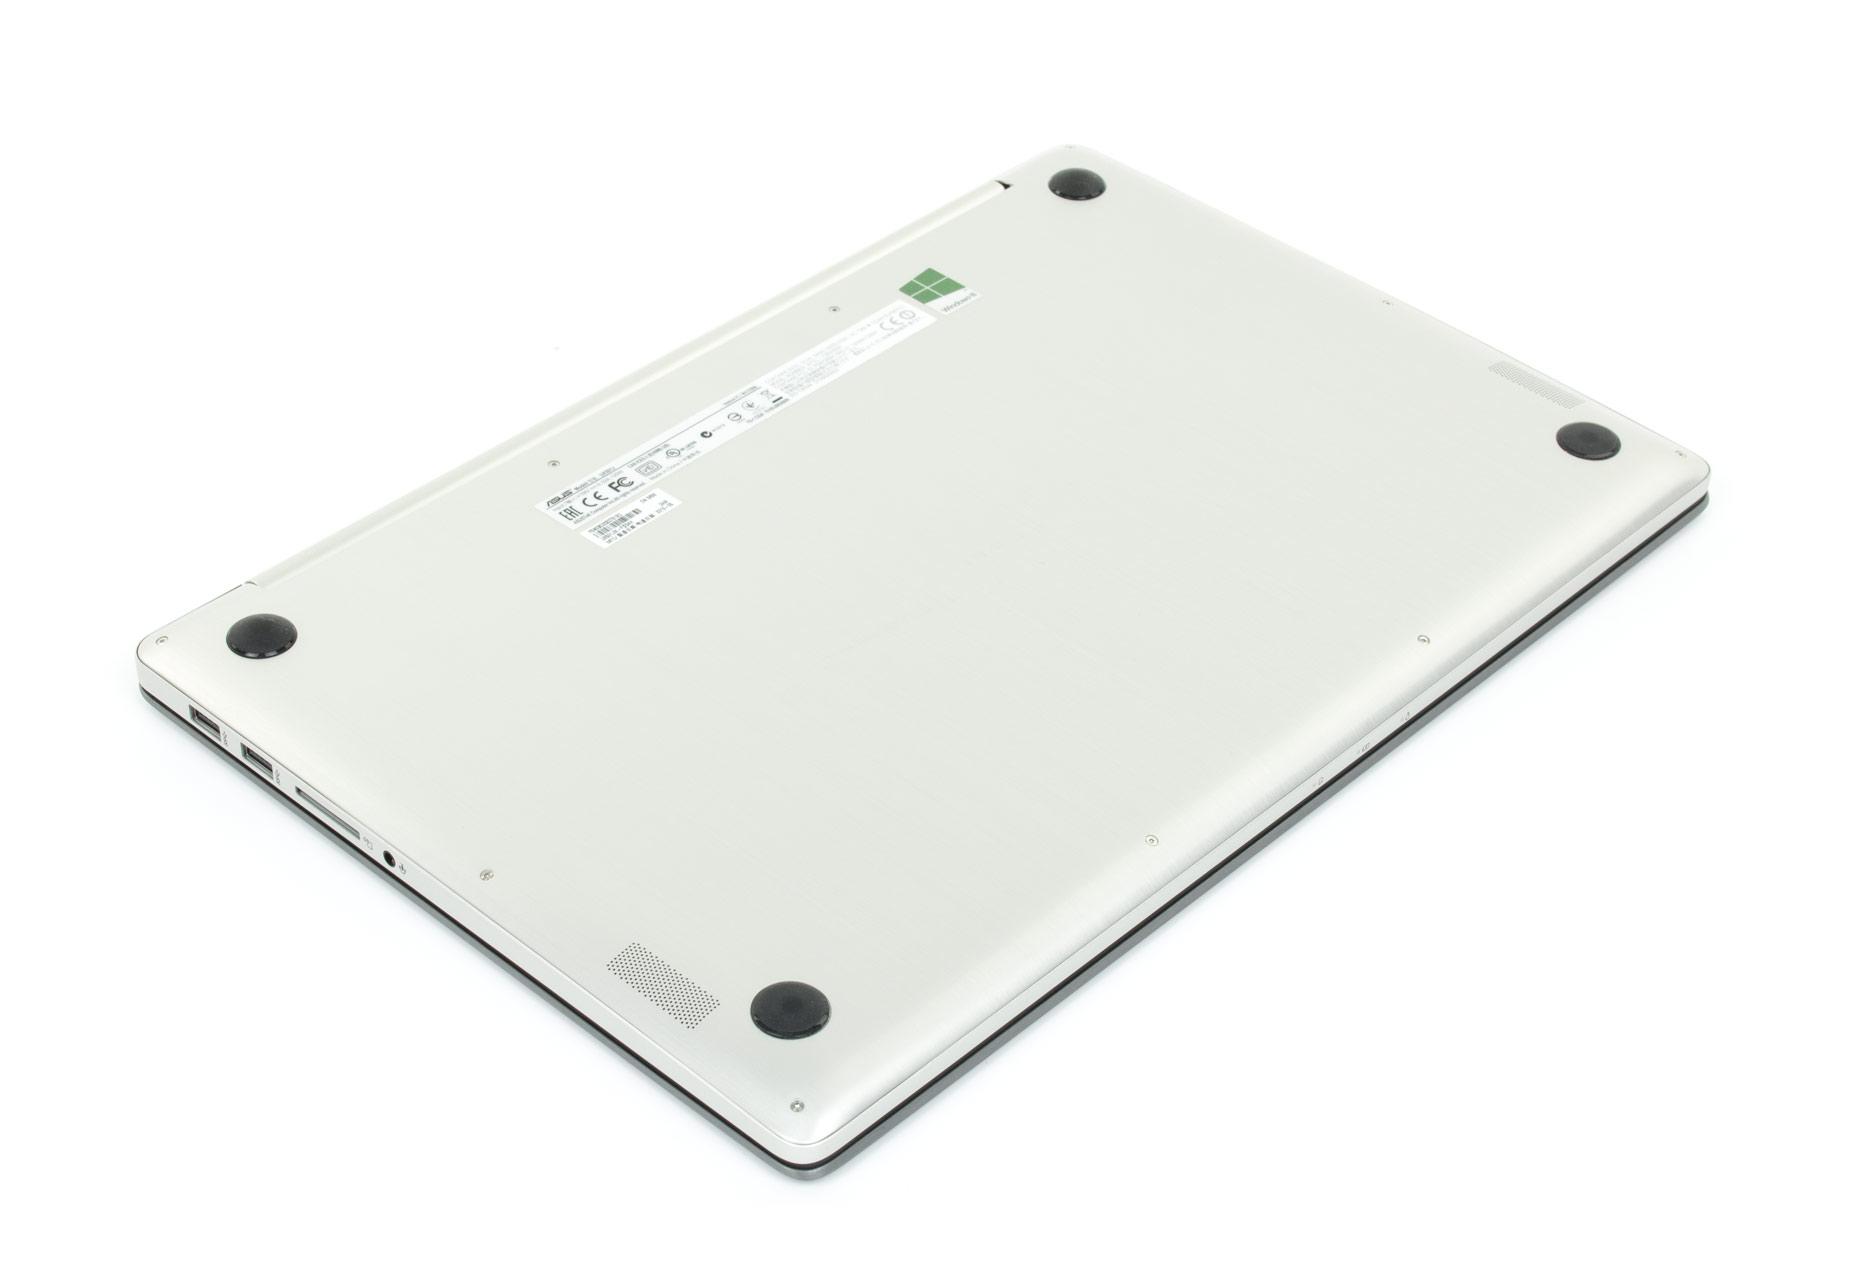 Asus Zenbook Pro UX501 spód obudowy